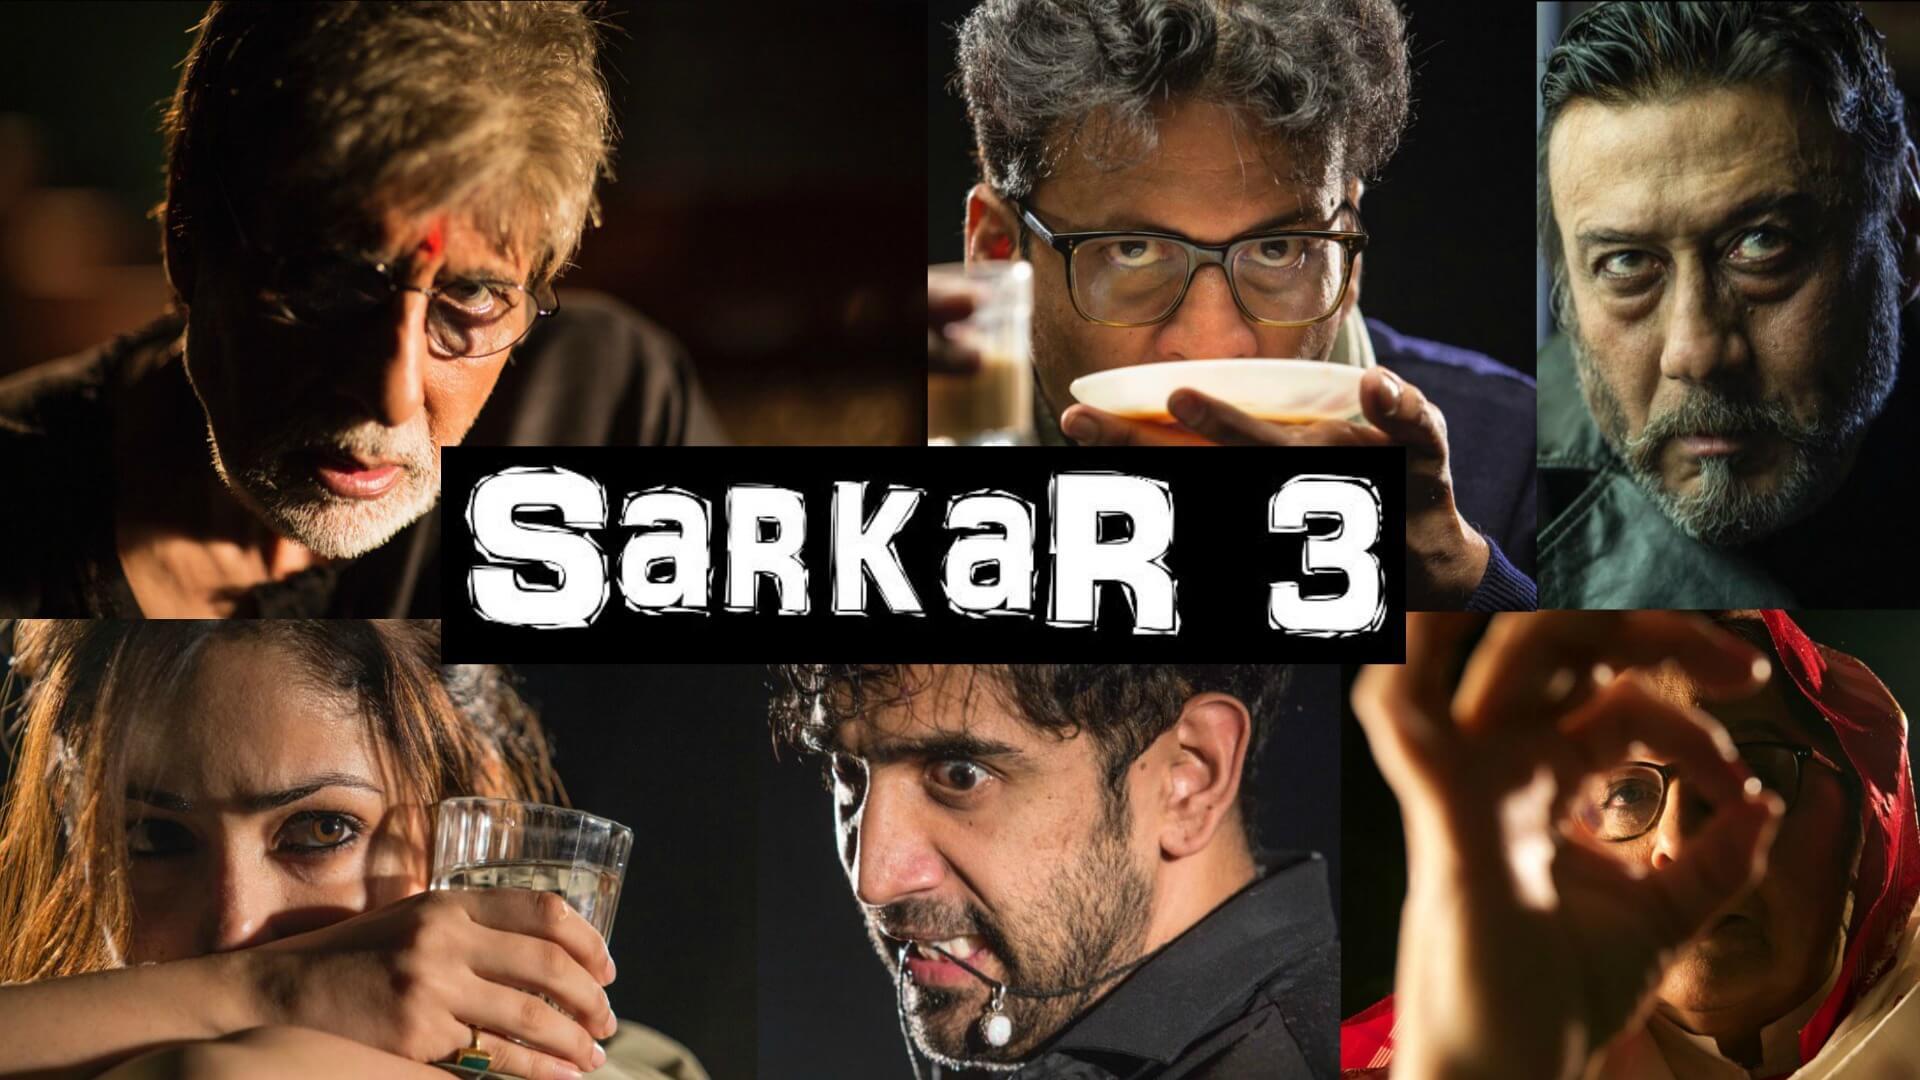 bp-sarkar-3-star-cast-amitabh-bachchan-jackie-shroff-rohini-manoj-bajpaye-yami-gautam_0